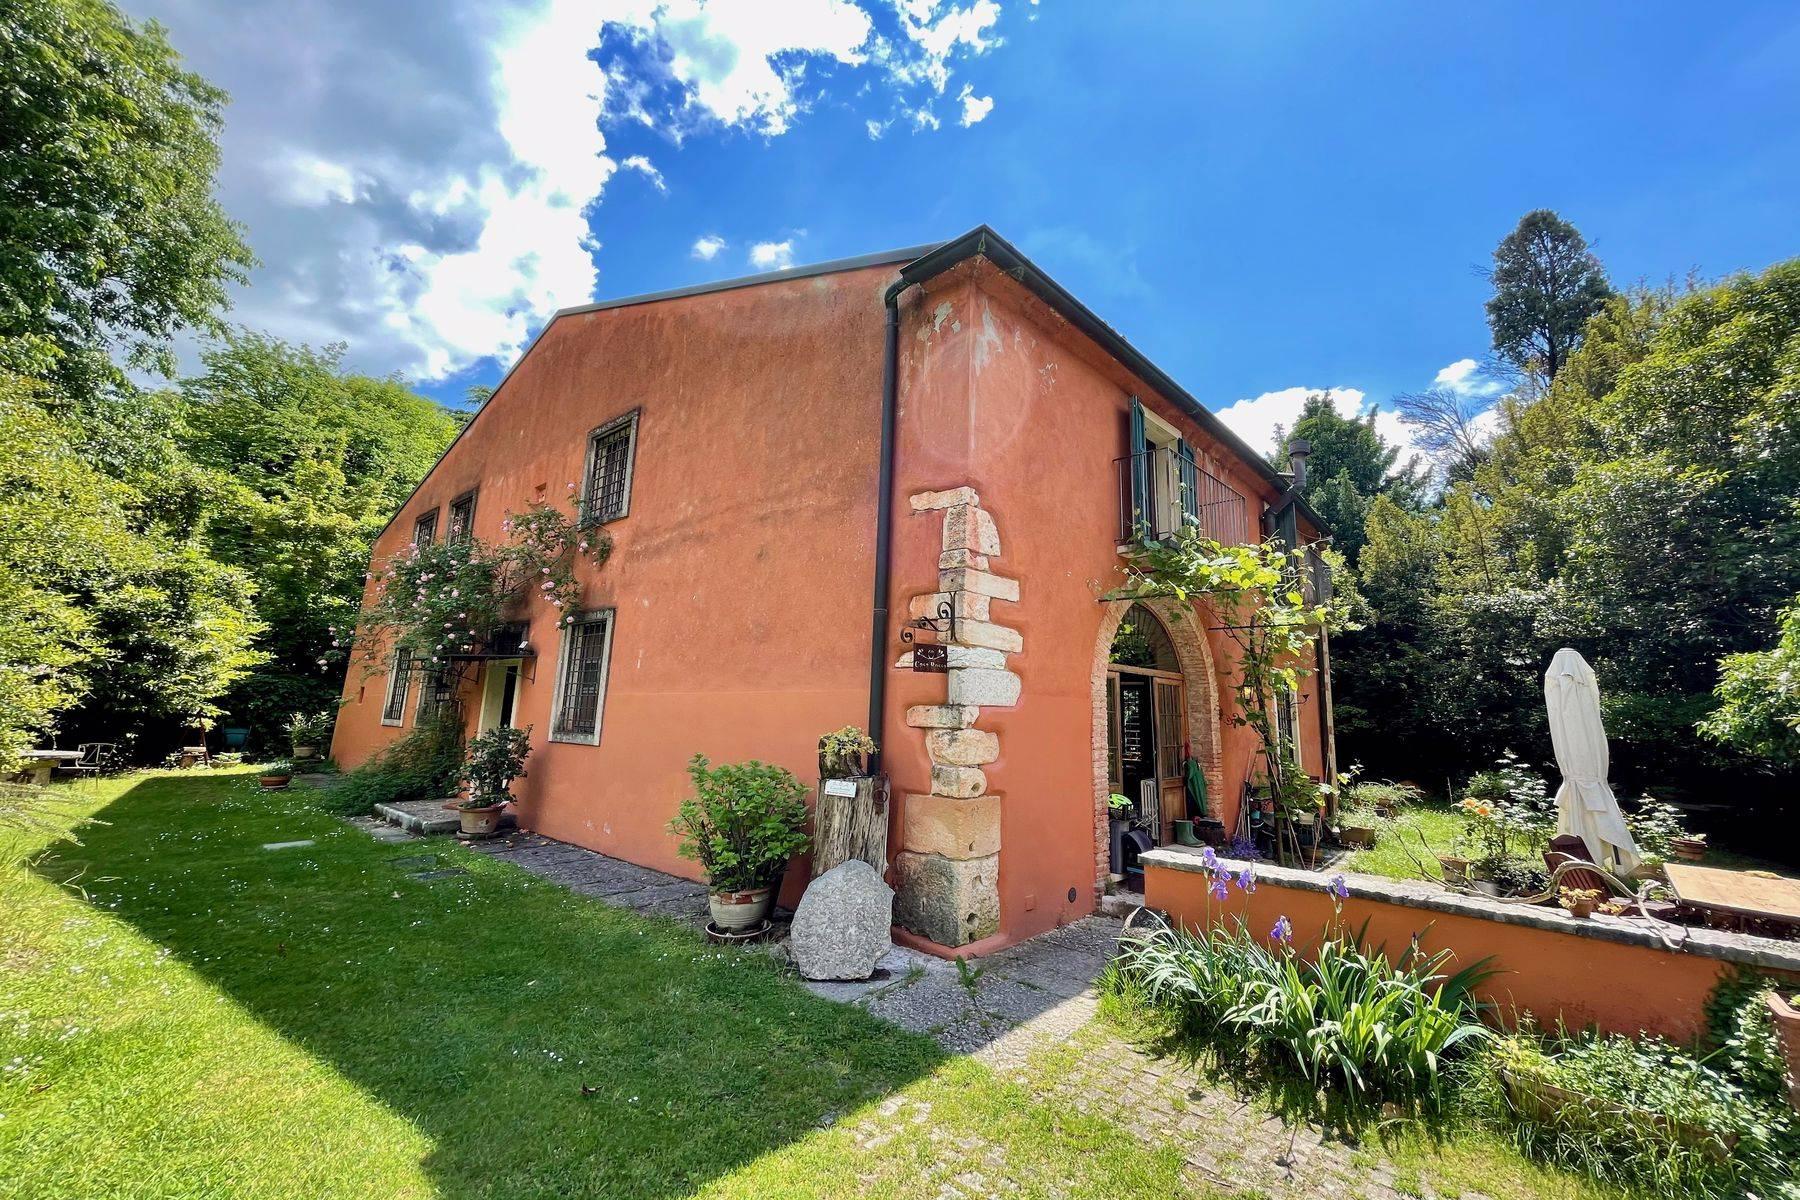 Rustico in Vendita a Verona: 5 locali, 350 mq - Foto 3